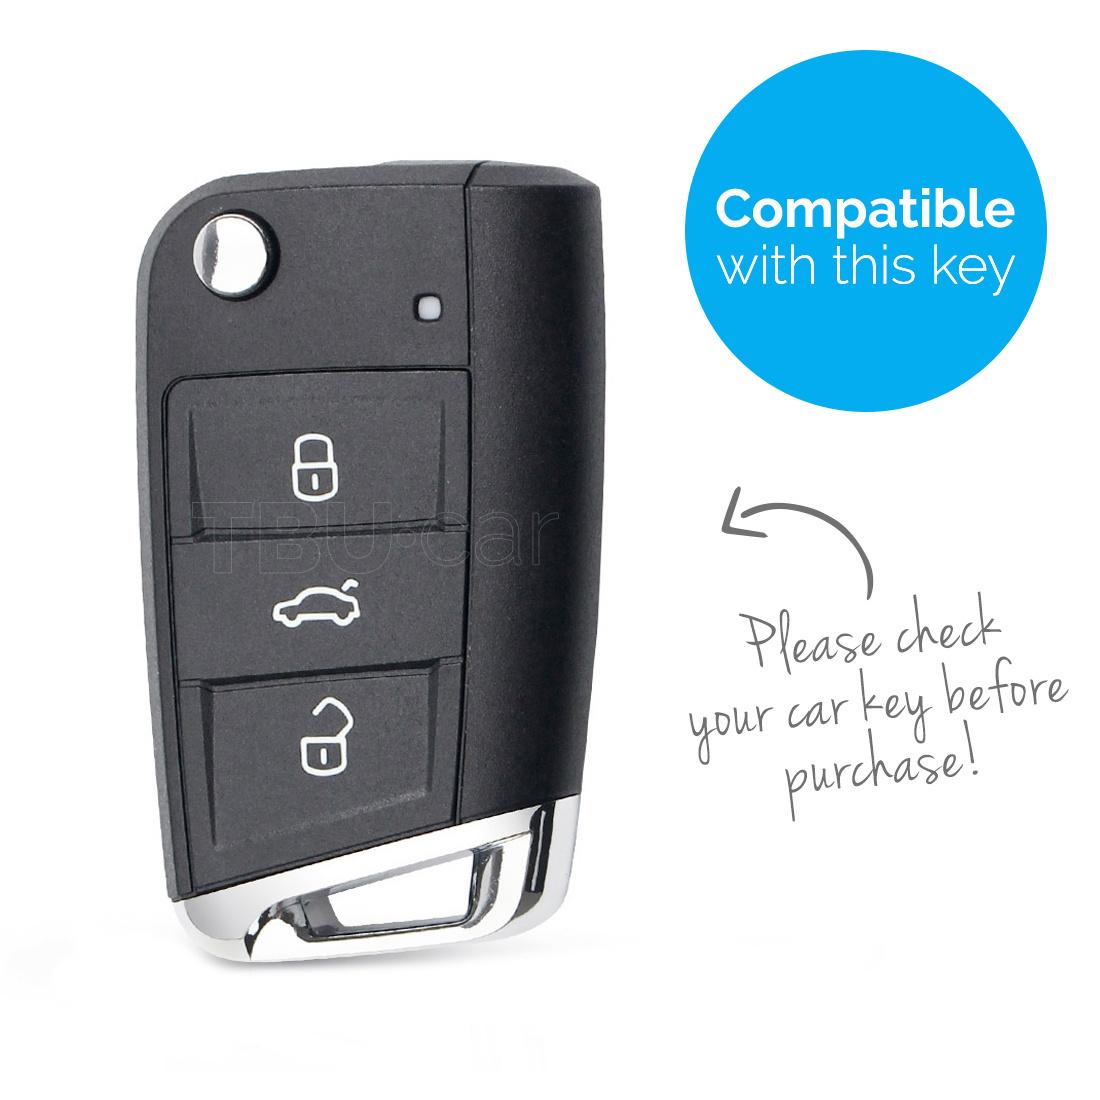 TBU car TBU car Sleutel cover compatibel met Audi - Silicone sleutelhoesje - beschermhoesje autosleutel - Paars